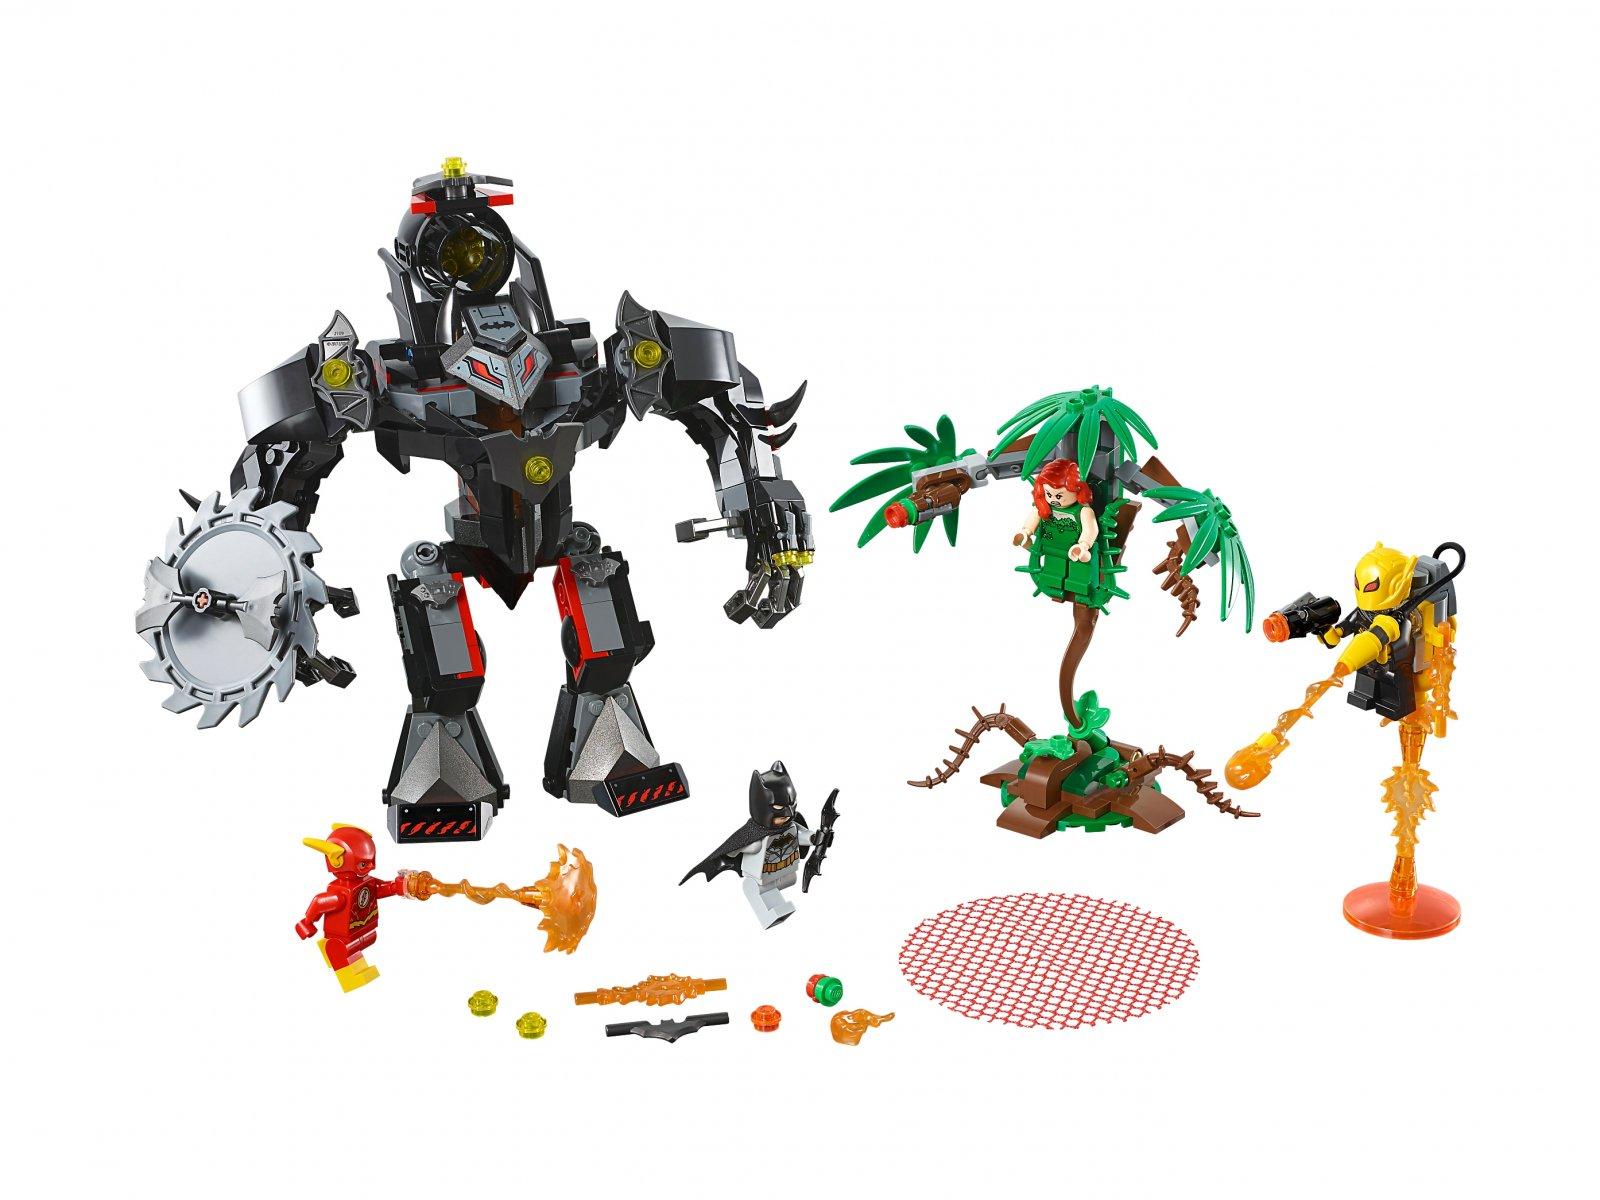 LEGO DC Comics™ Super Heroes Mech Batmana™ kontra mech Trującego Bluszcza™ 76117